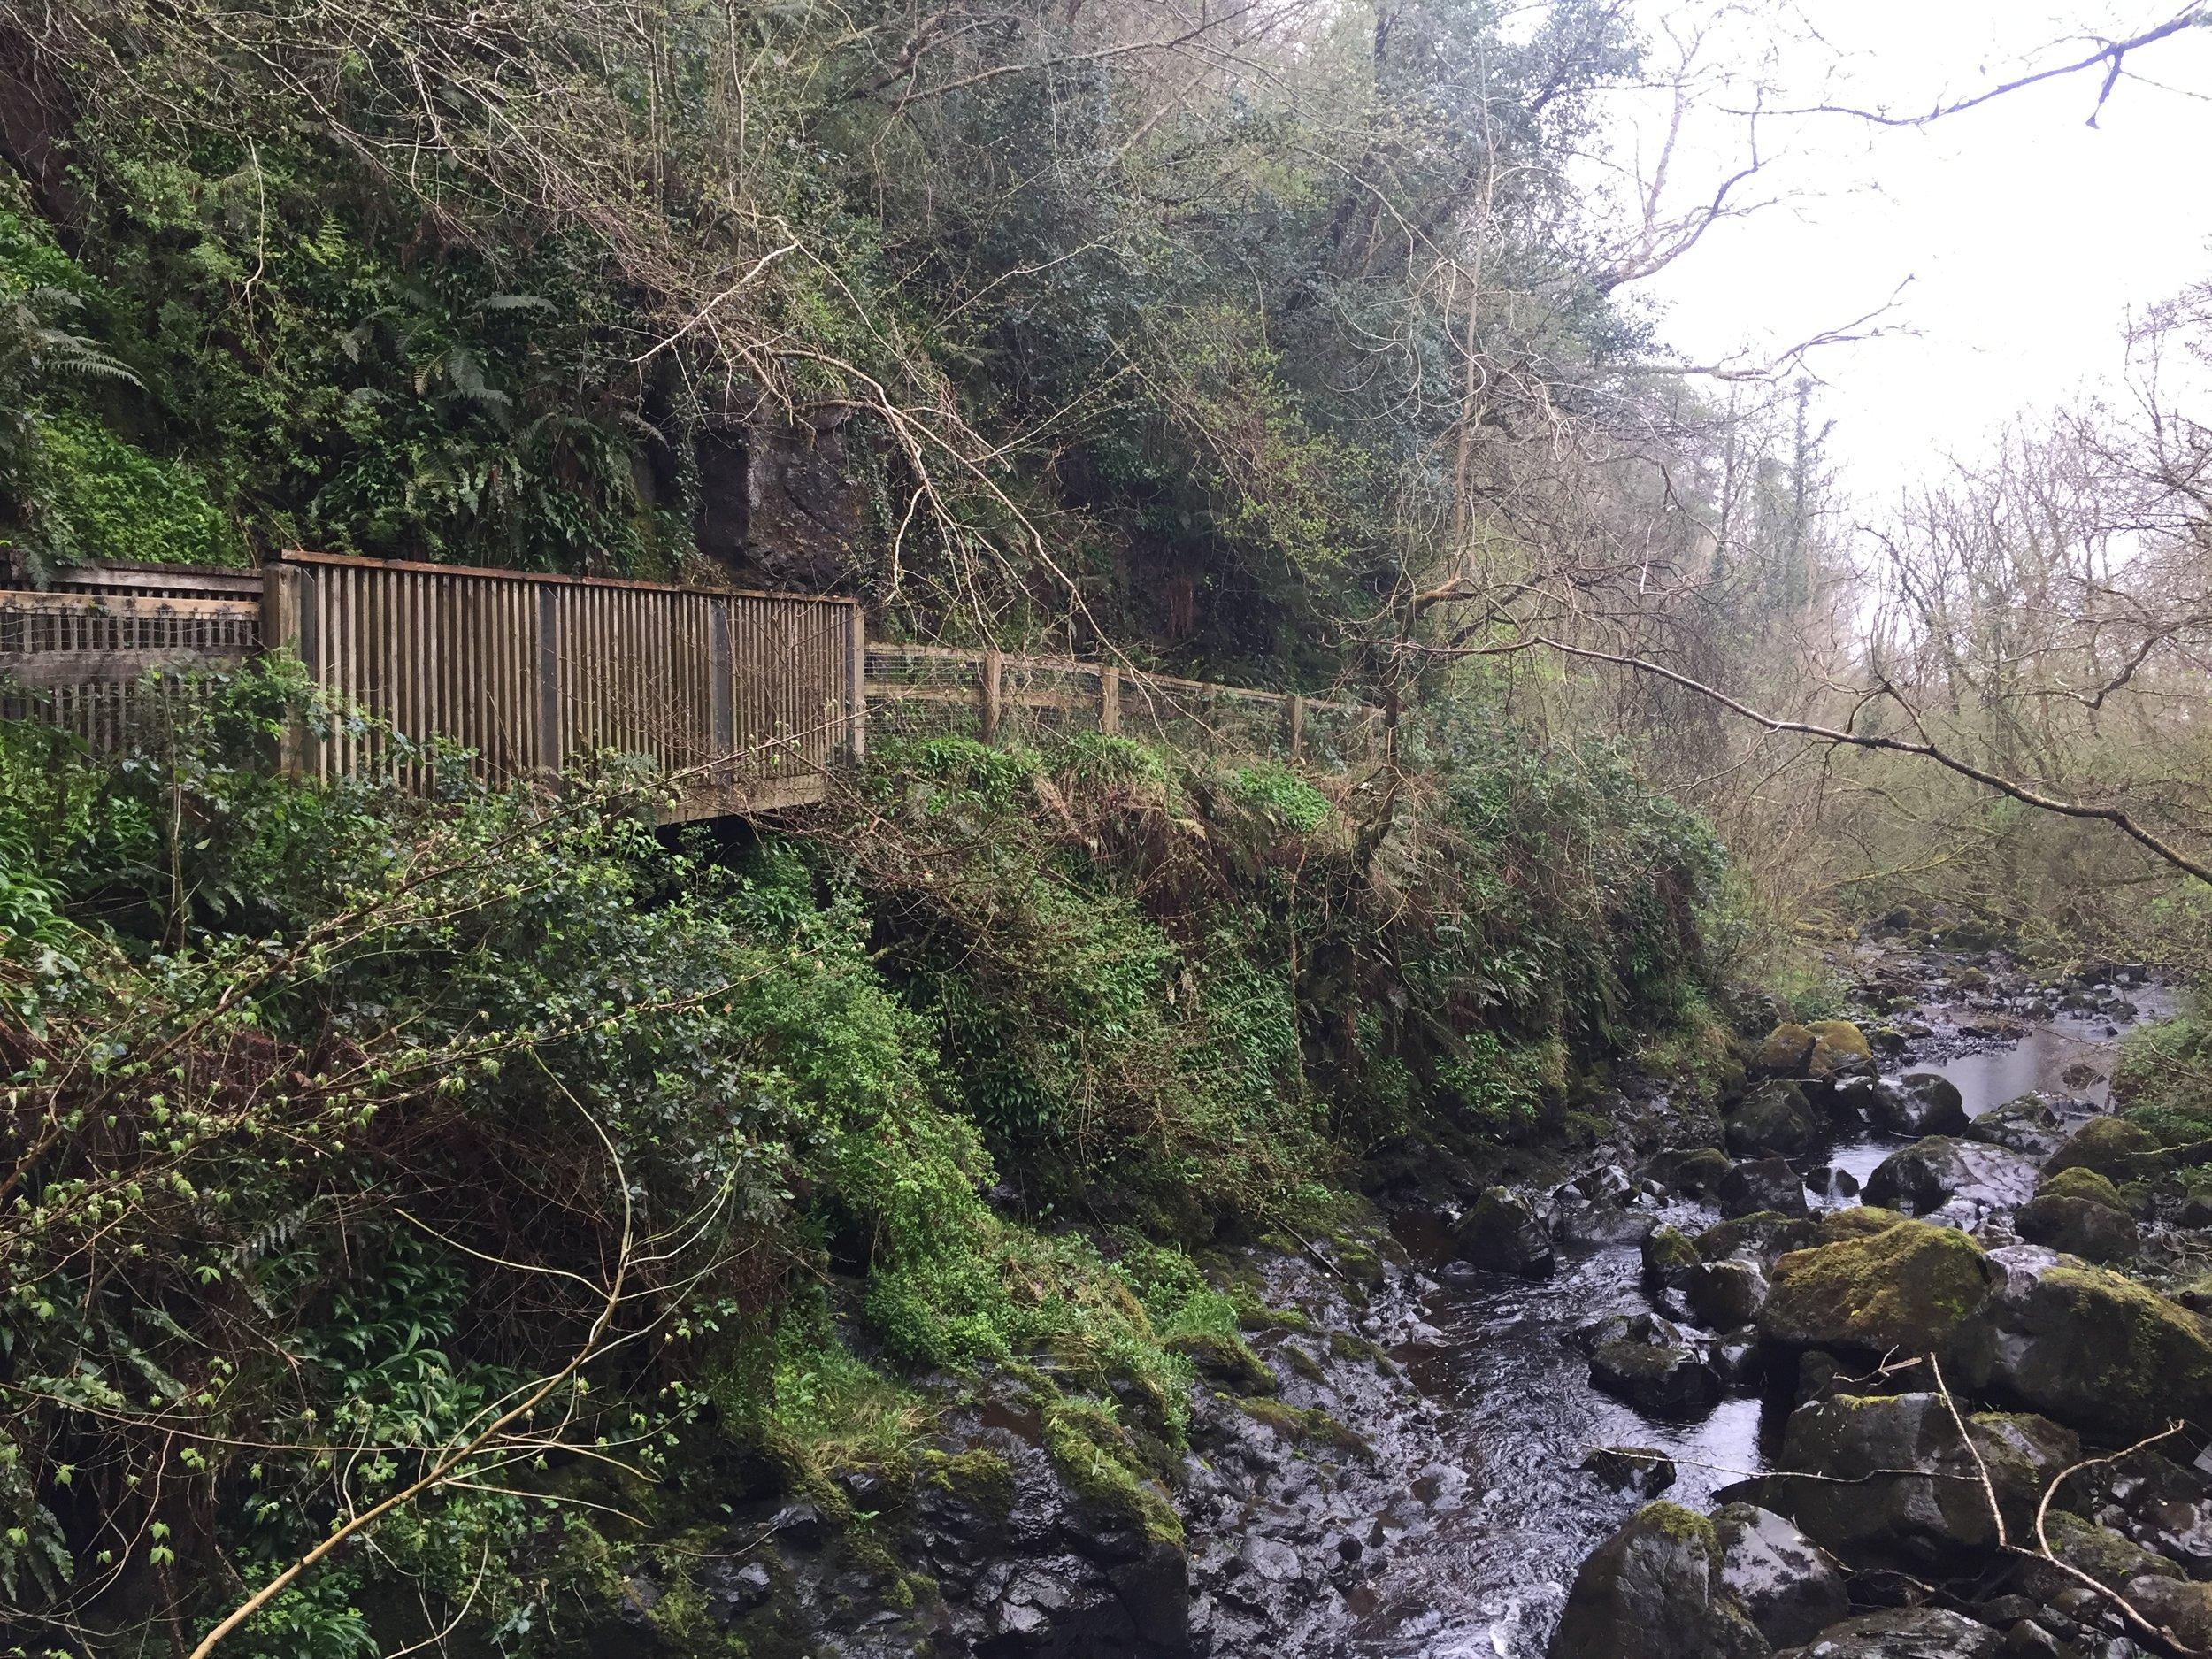 cranny_falls_carnlough_antrim_coast_northern_ireland_ni_explorer_niexplorer.jpg